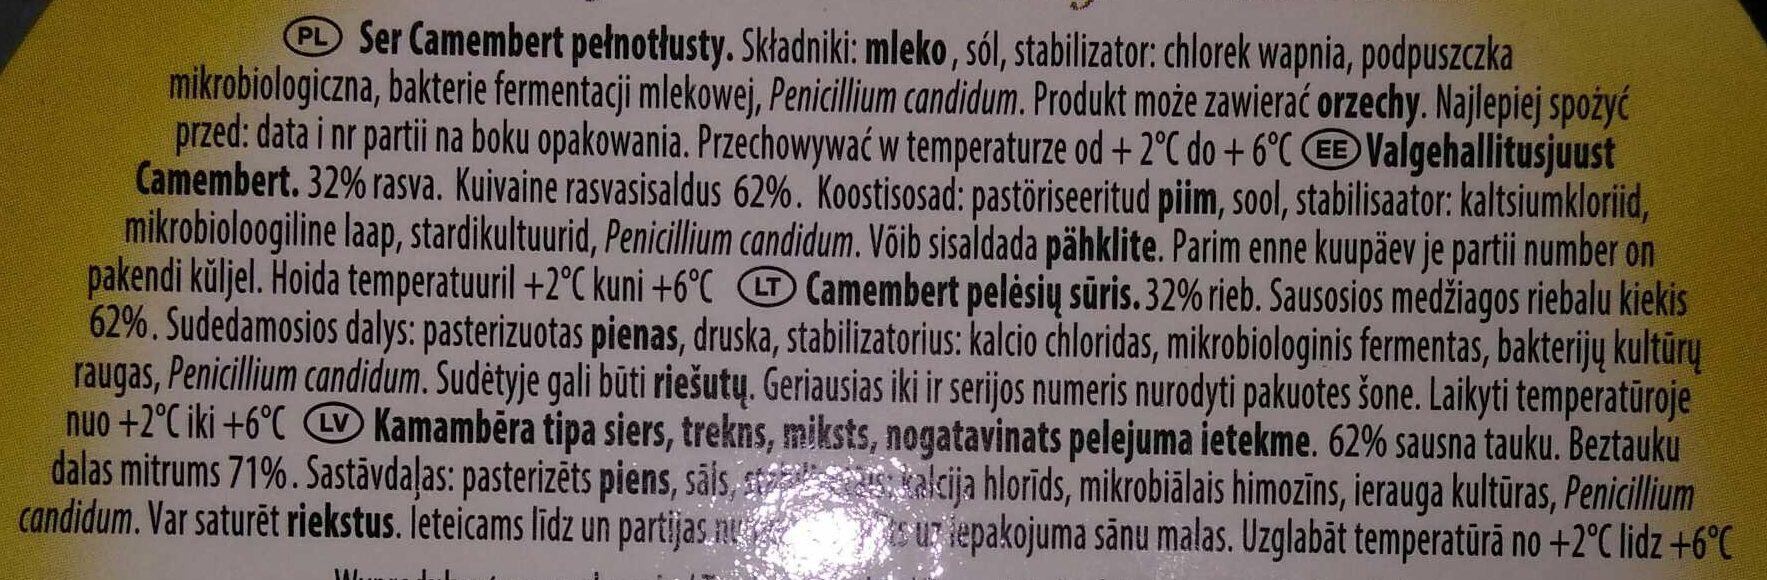 Camembert - Ingredients - lt